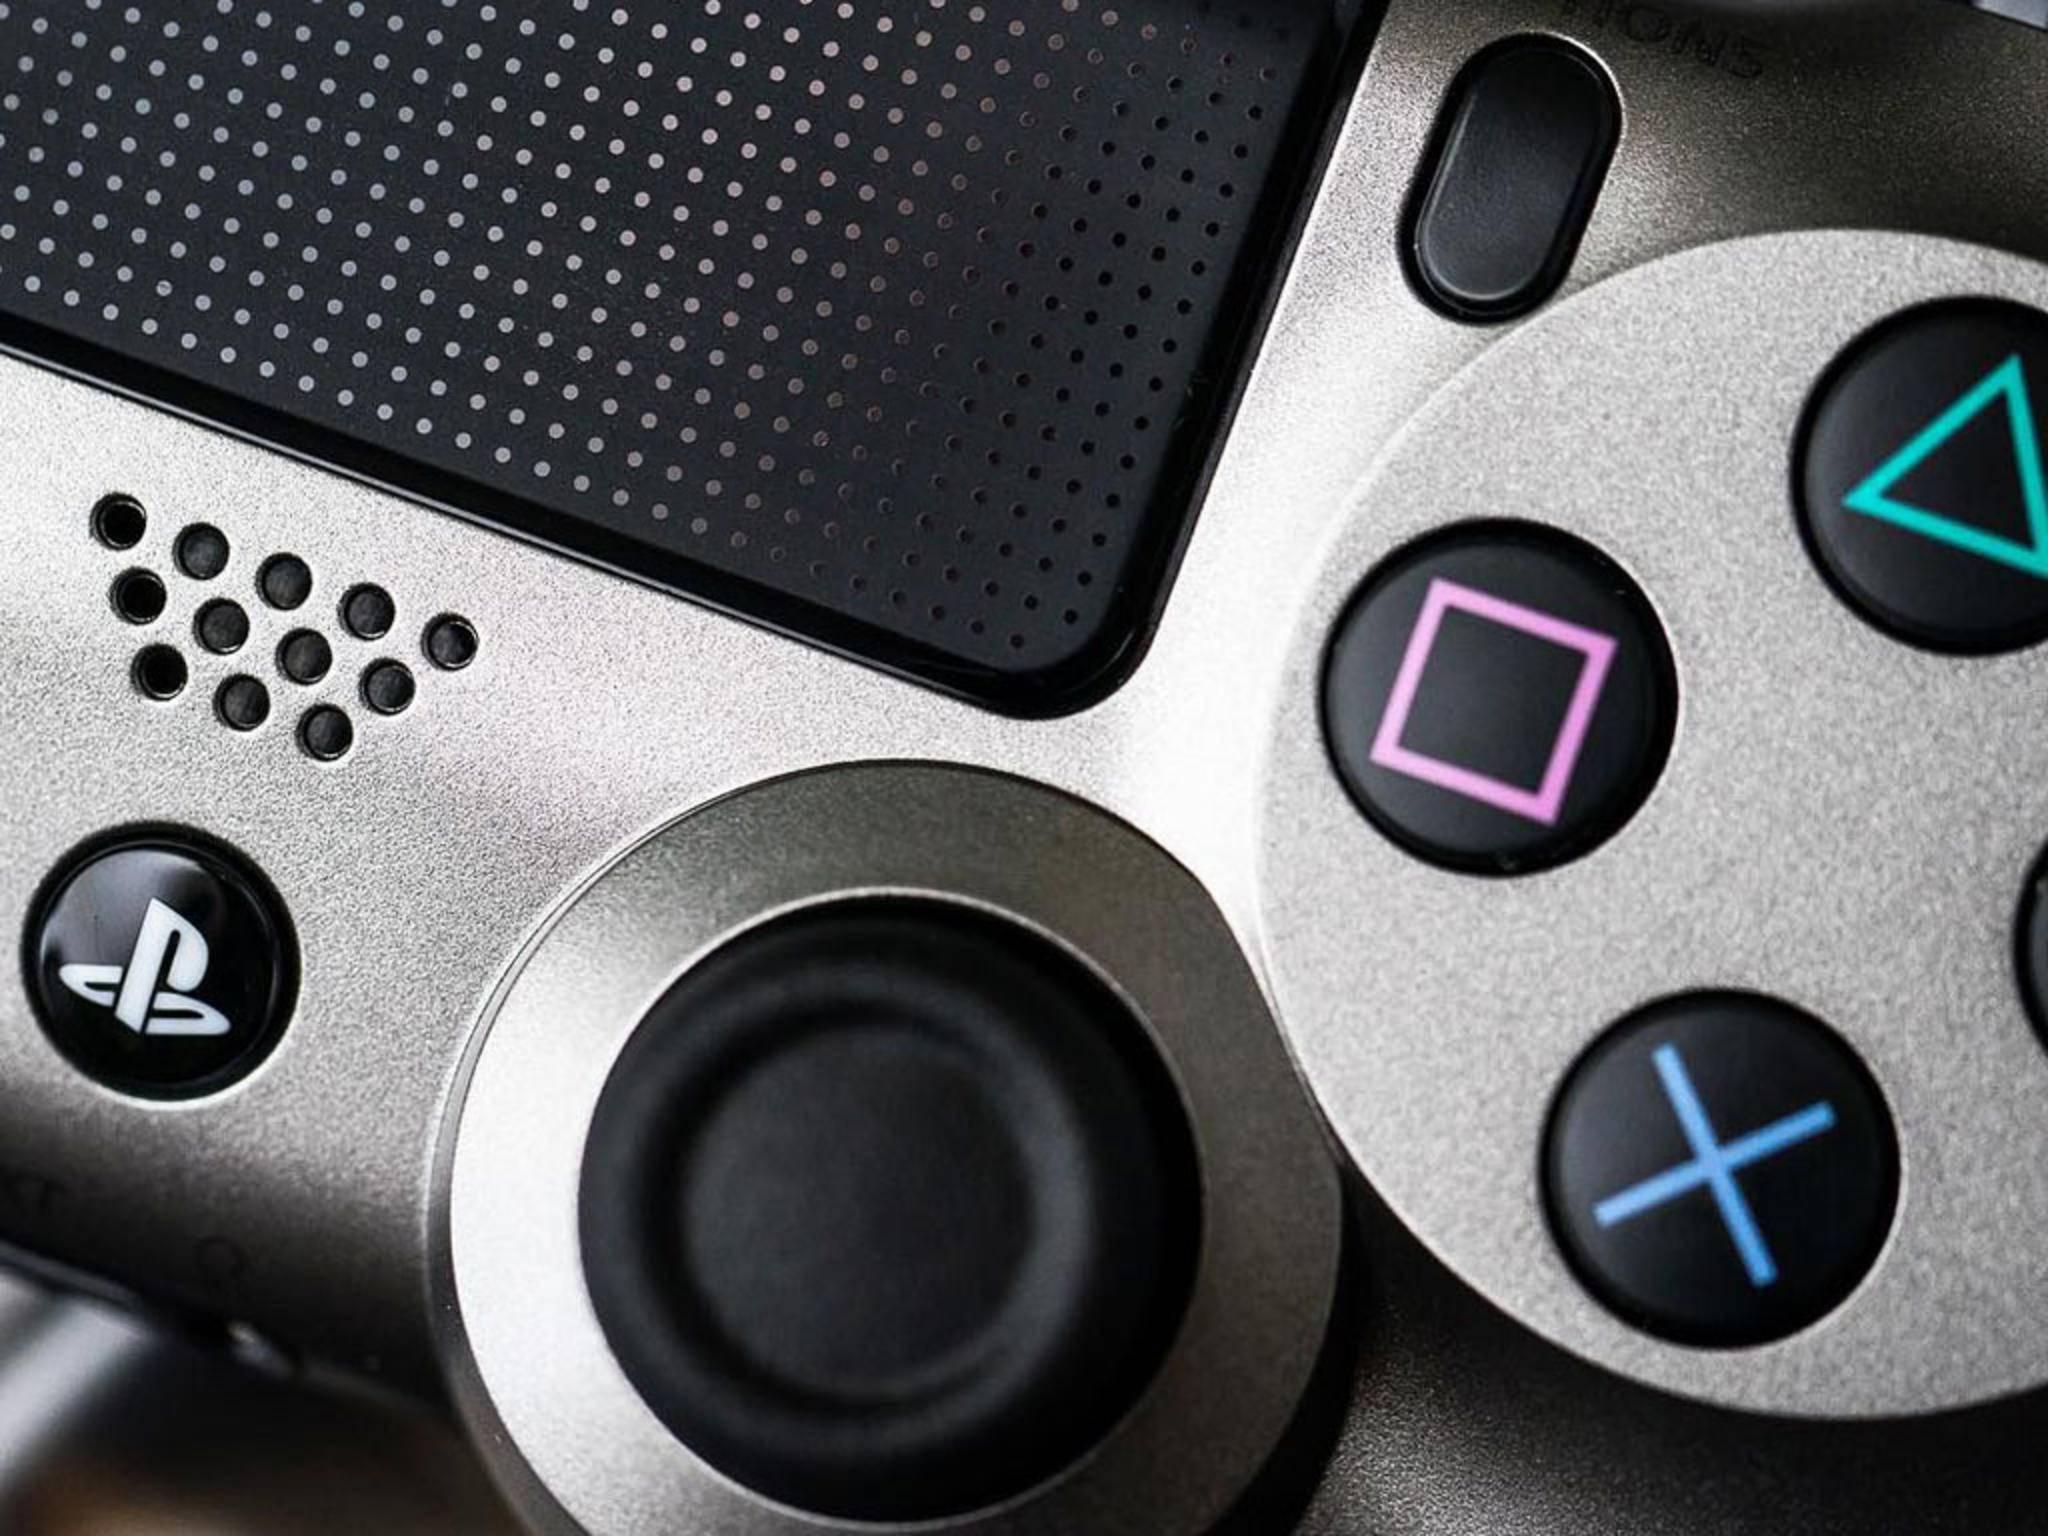 Die PlayStation 4 bekommt bald ein großes Software-Update.